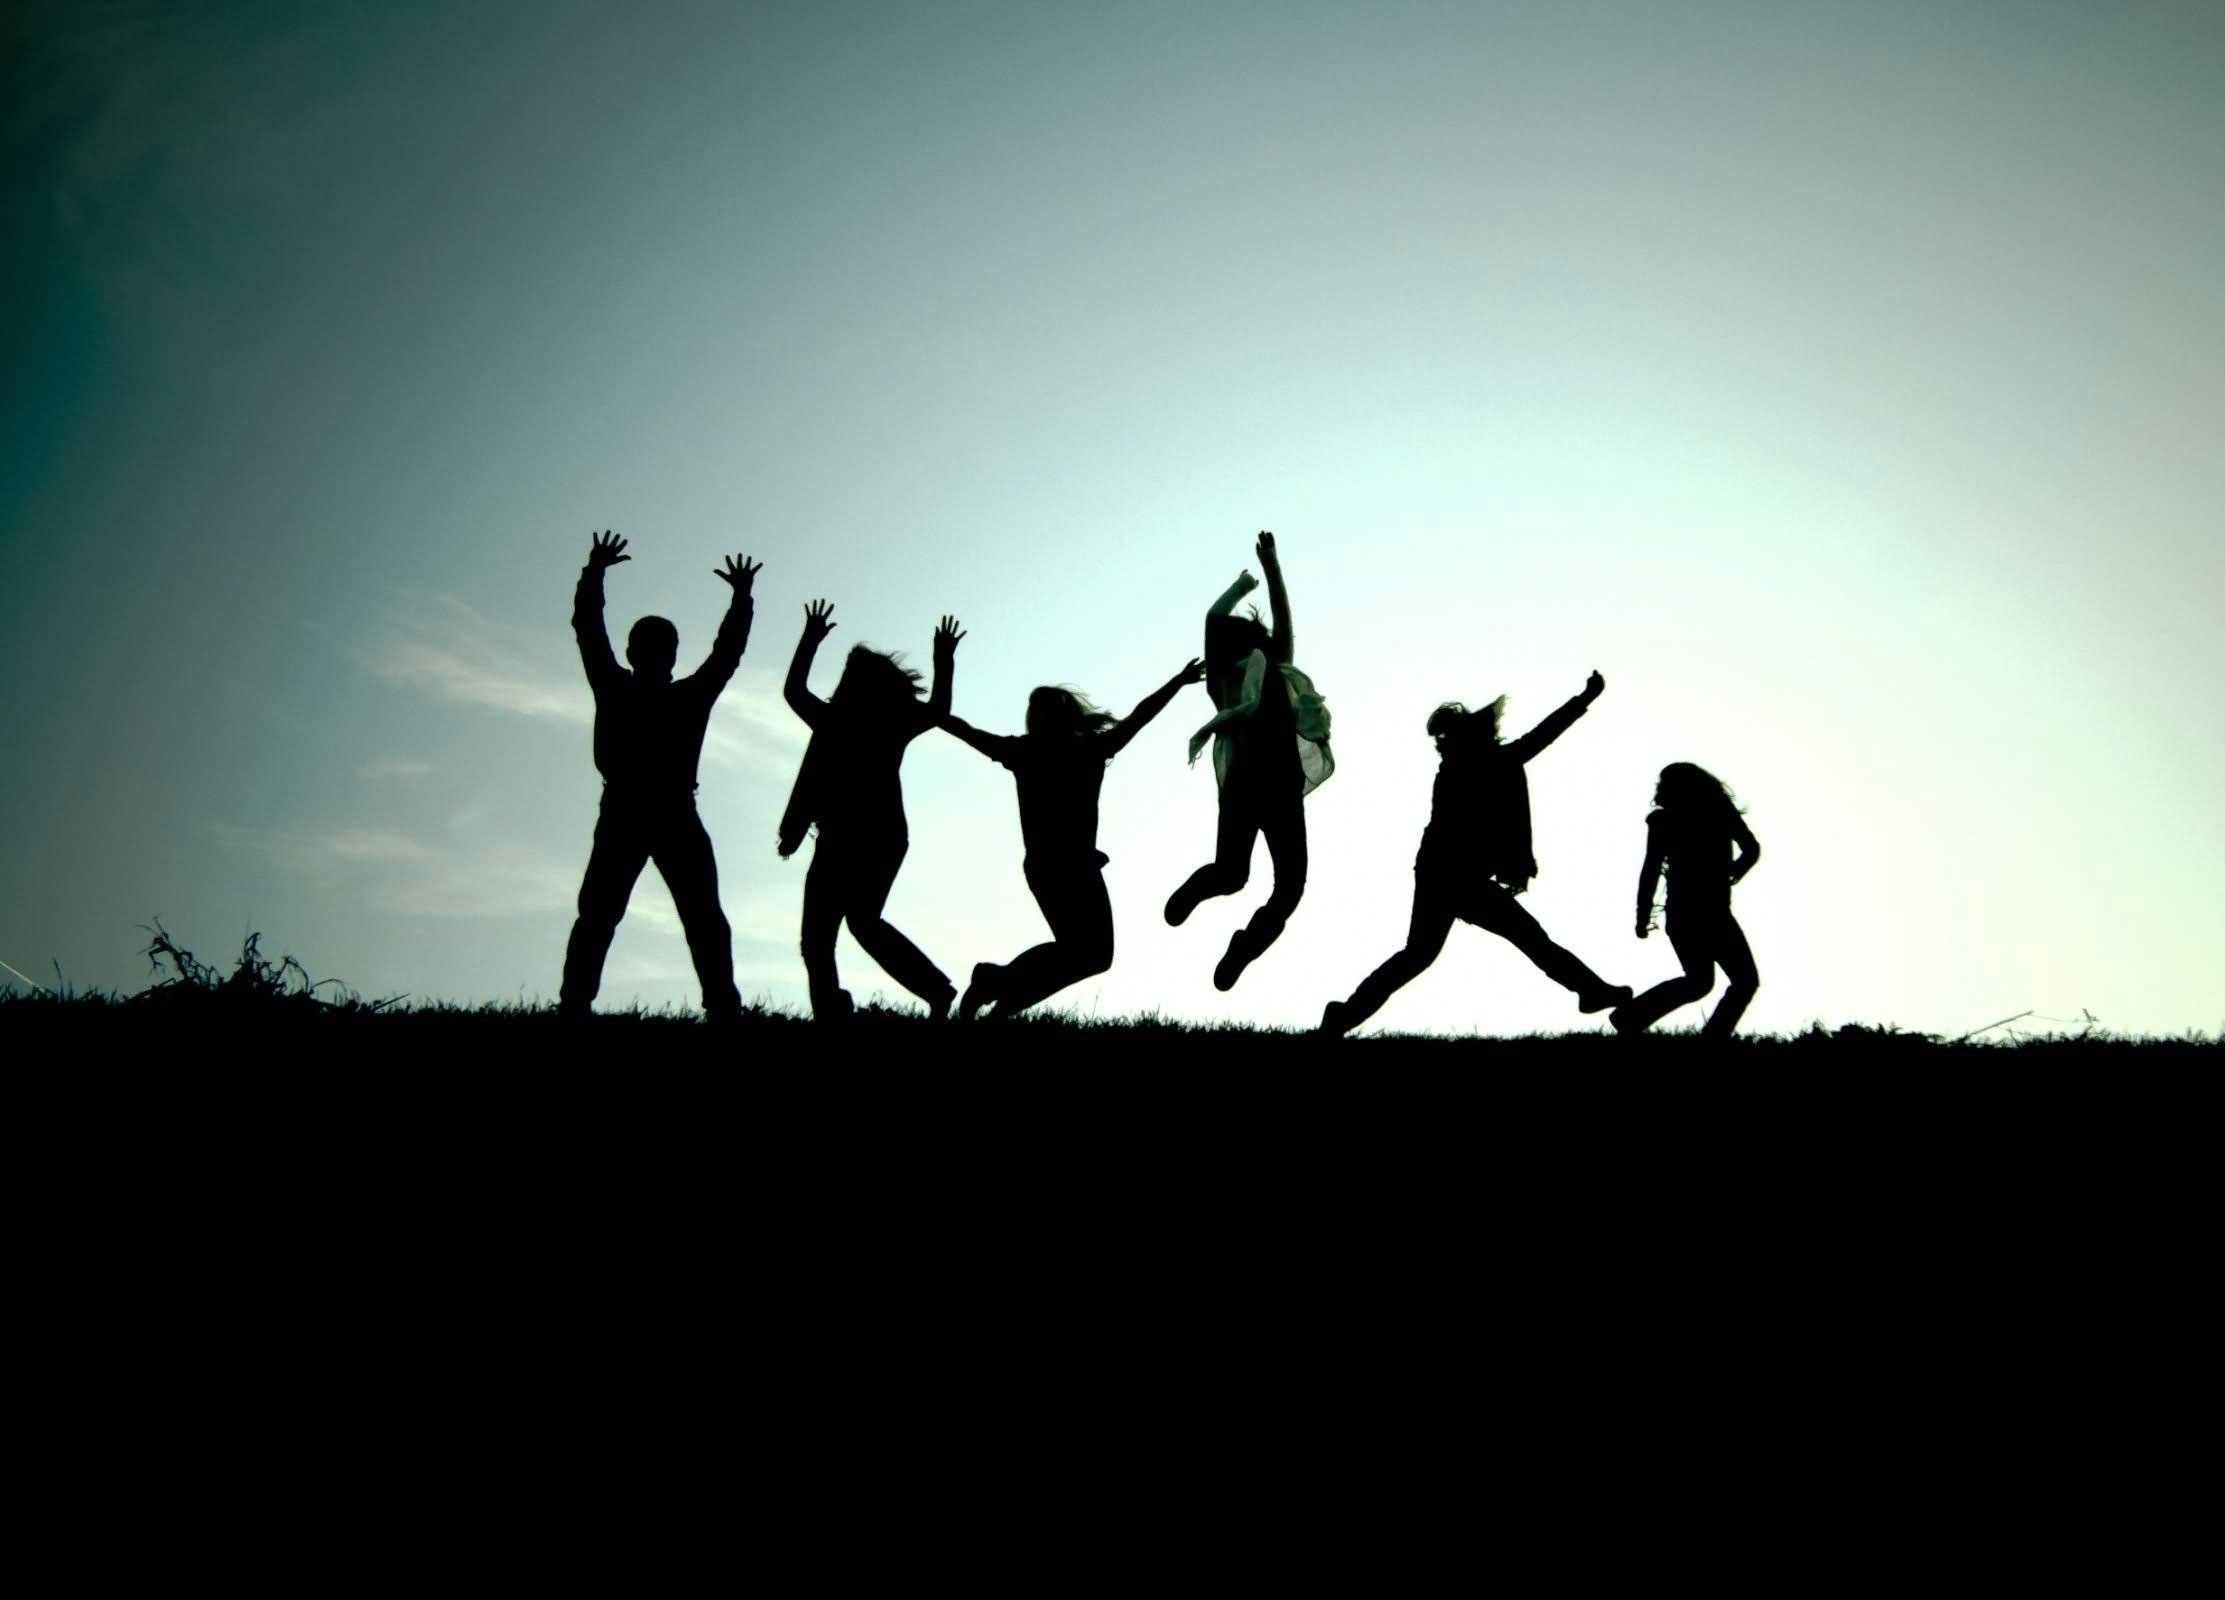 Group Whatsapp DP Photo Wallpaper